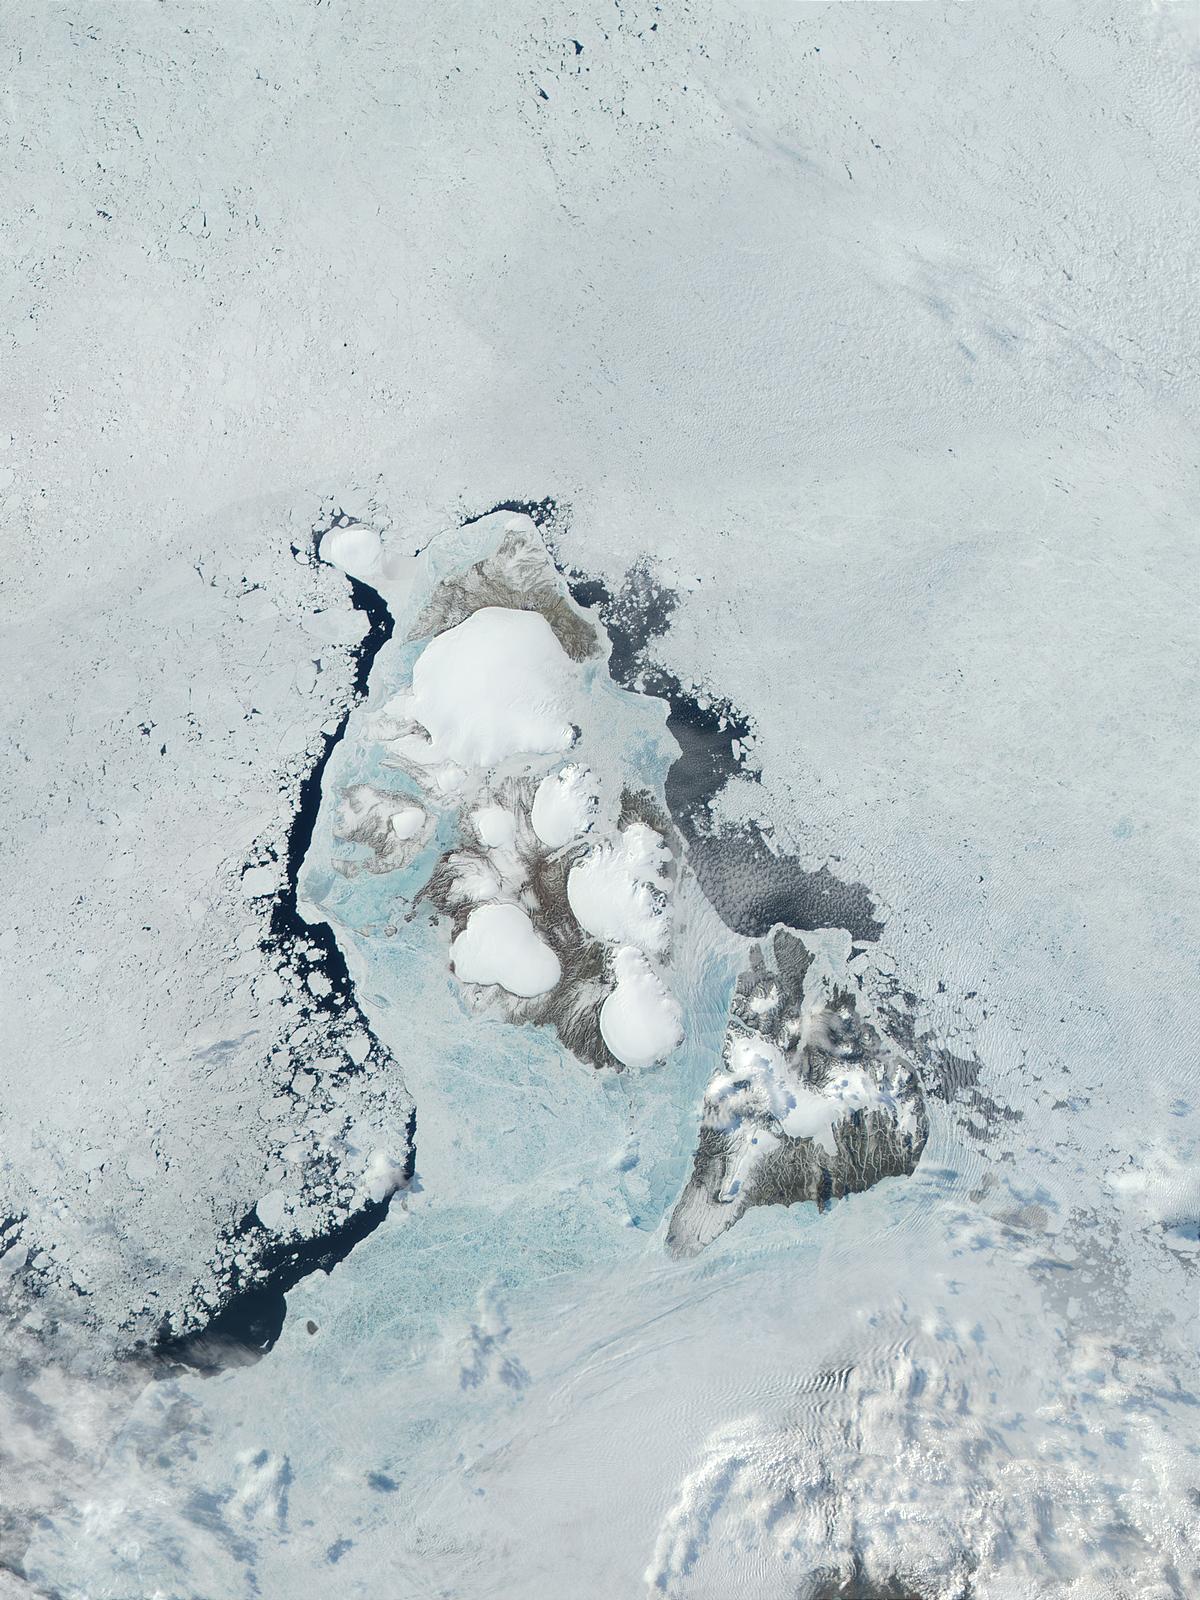 Terra/MODIS image of Severnaya Zemlya